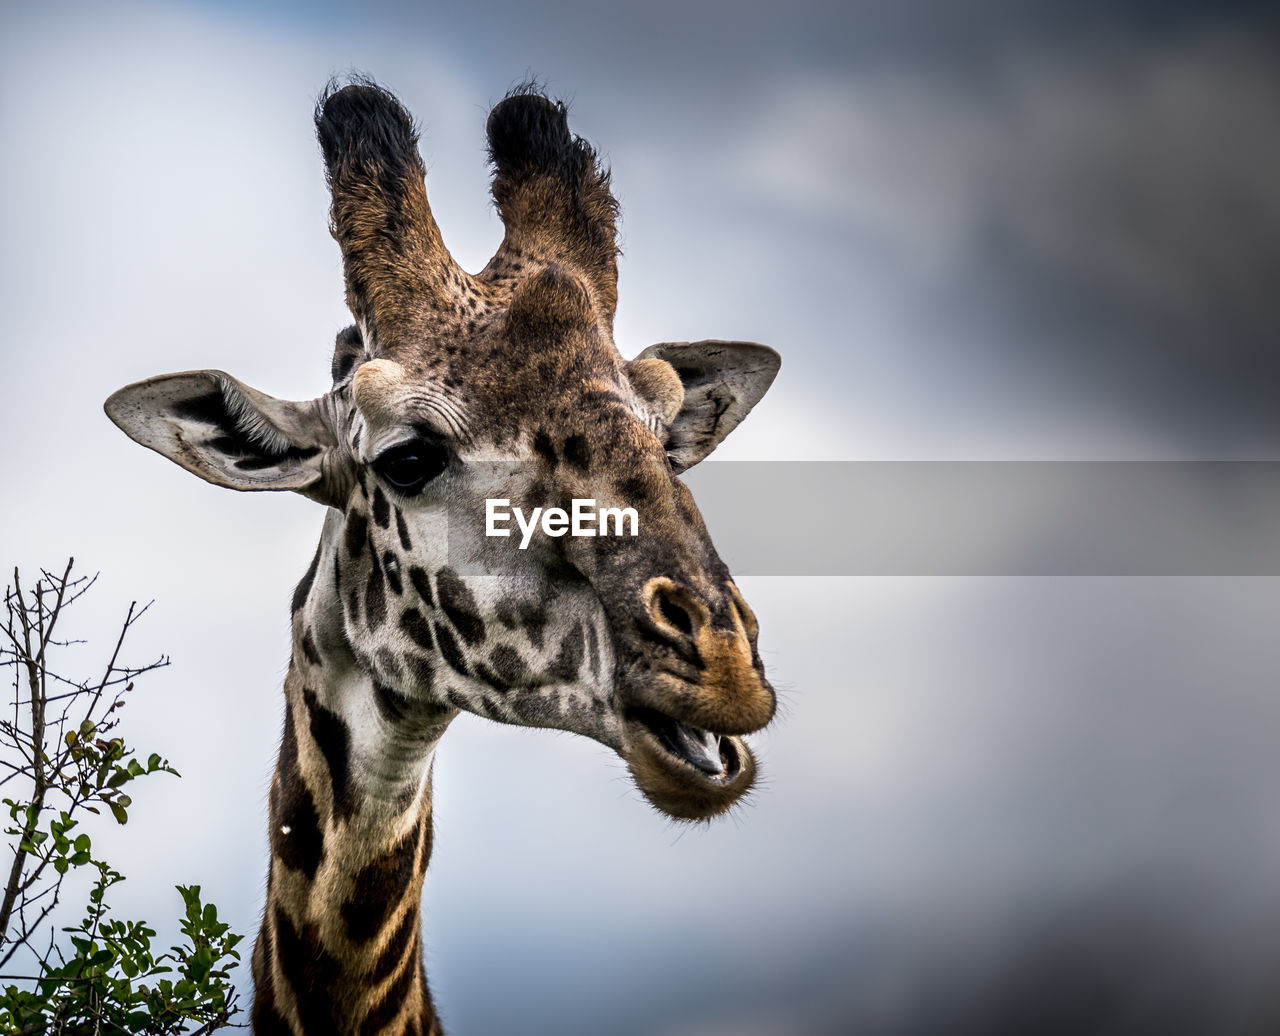 A comic headshot of a giraffe